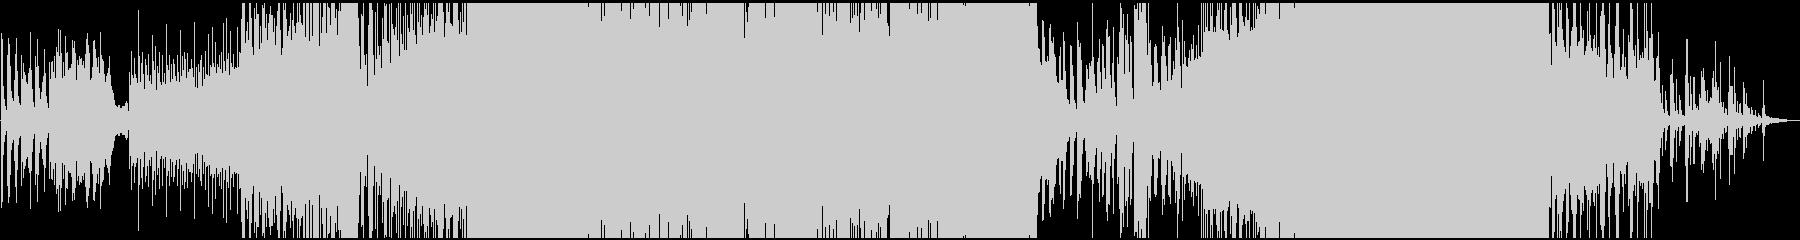 EDM:ピアノ主体でカッコよくおしゃれの未再生の波形